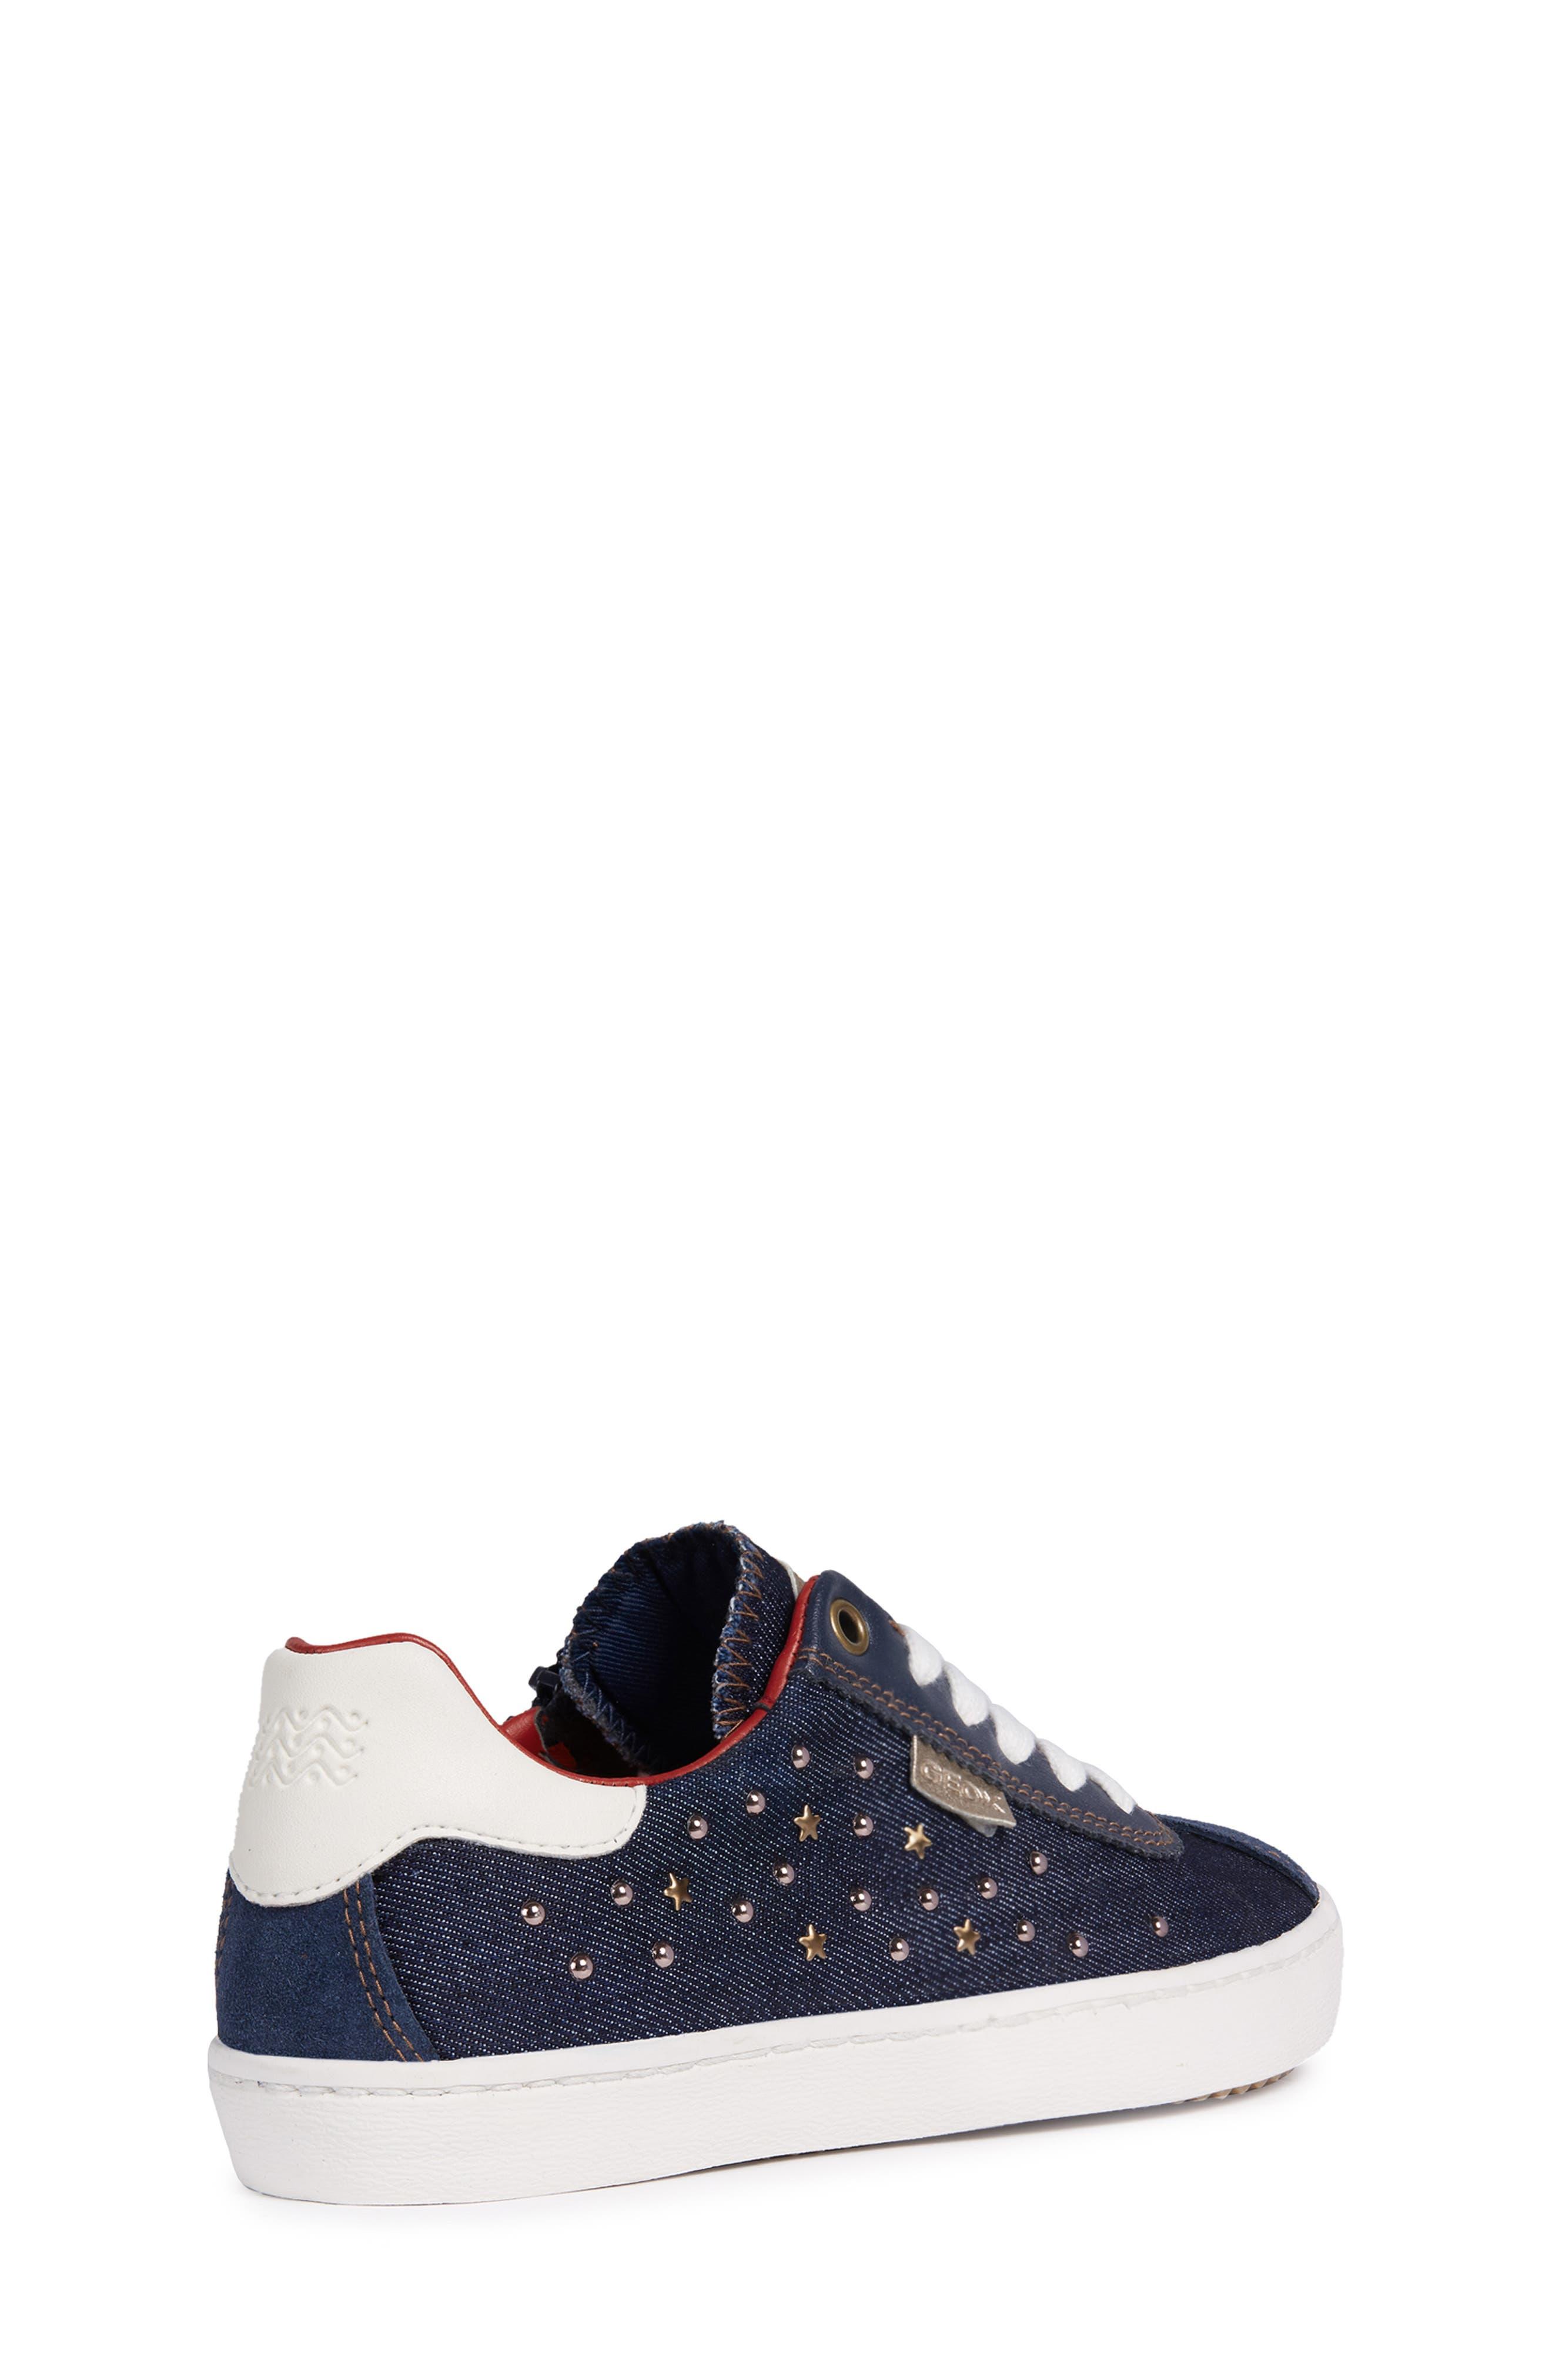 Kilwi Zip Low Top Sneaker,                             Alternate thumbnail 6, color,                             NAVY